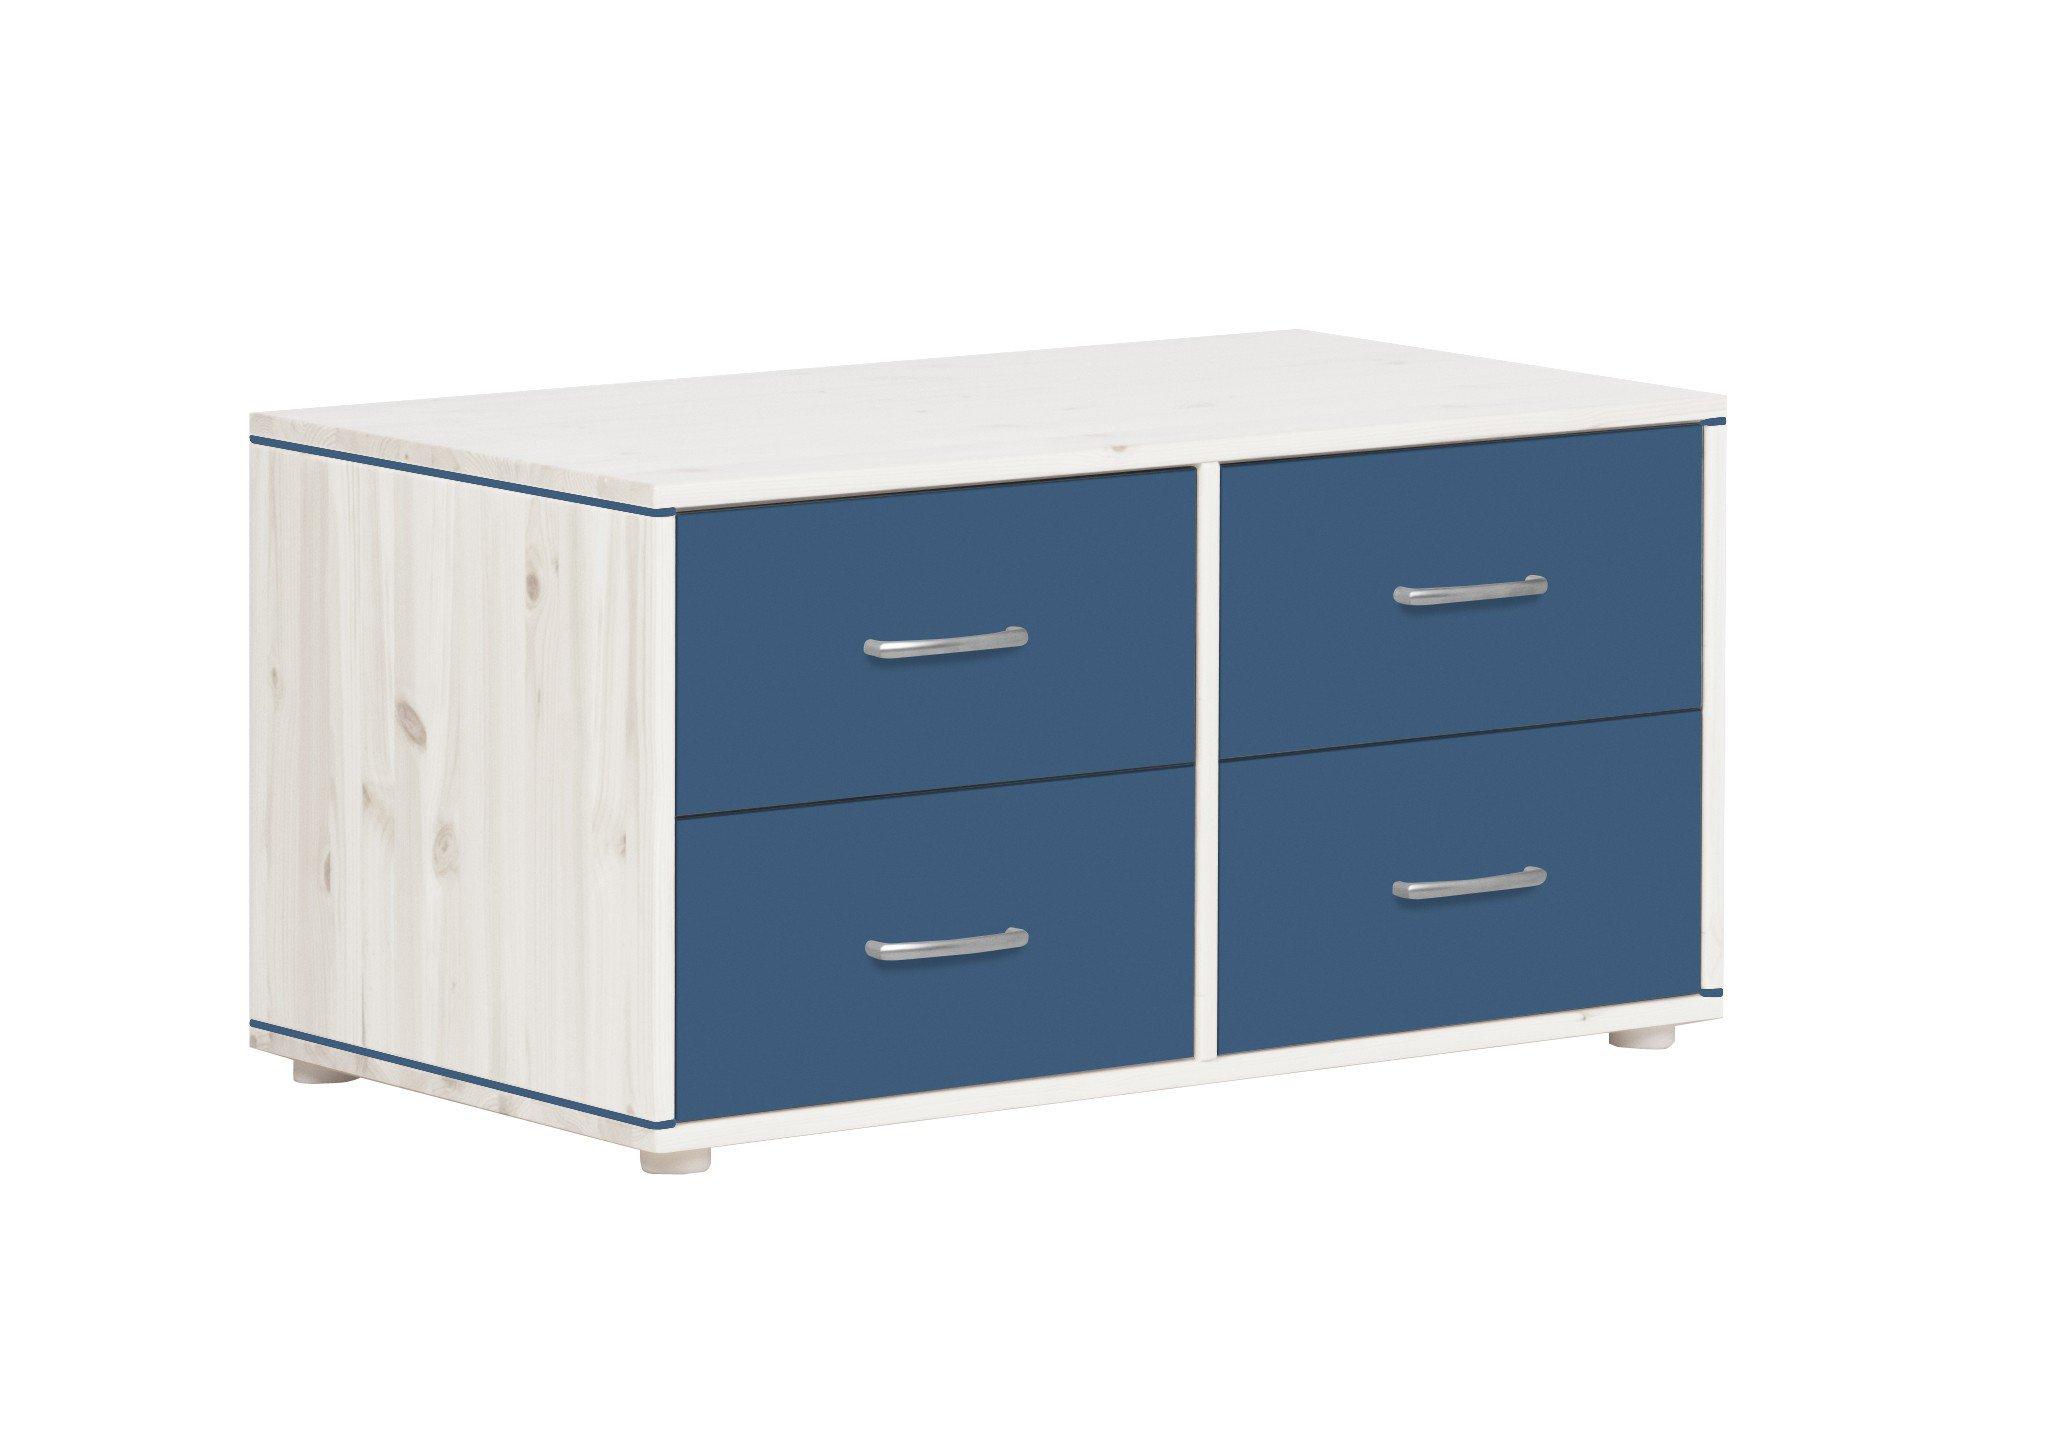 kommode kiefer wei skandinavische m bel m bel letz ihr online shop. Black Bedroom Furniture Sets. Home Design Ideas